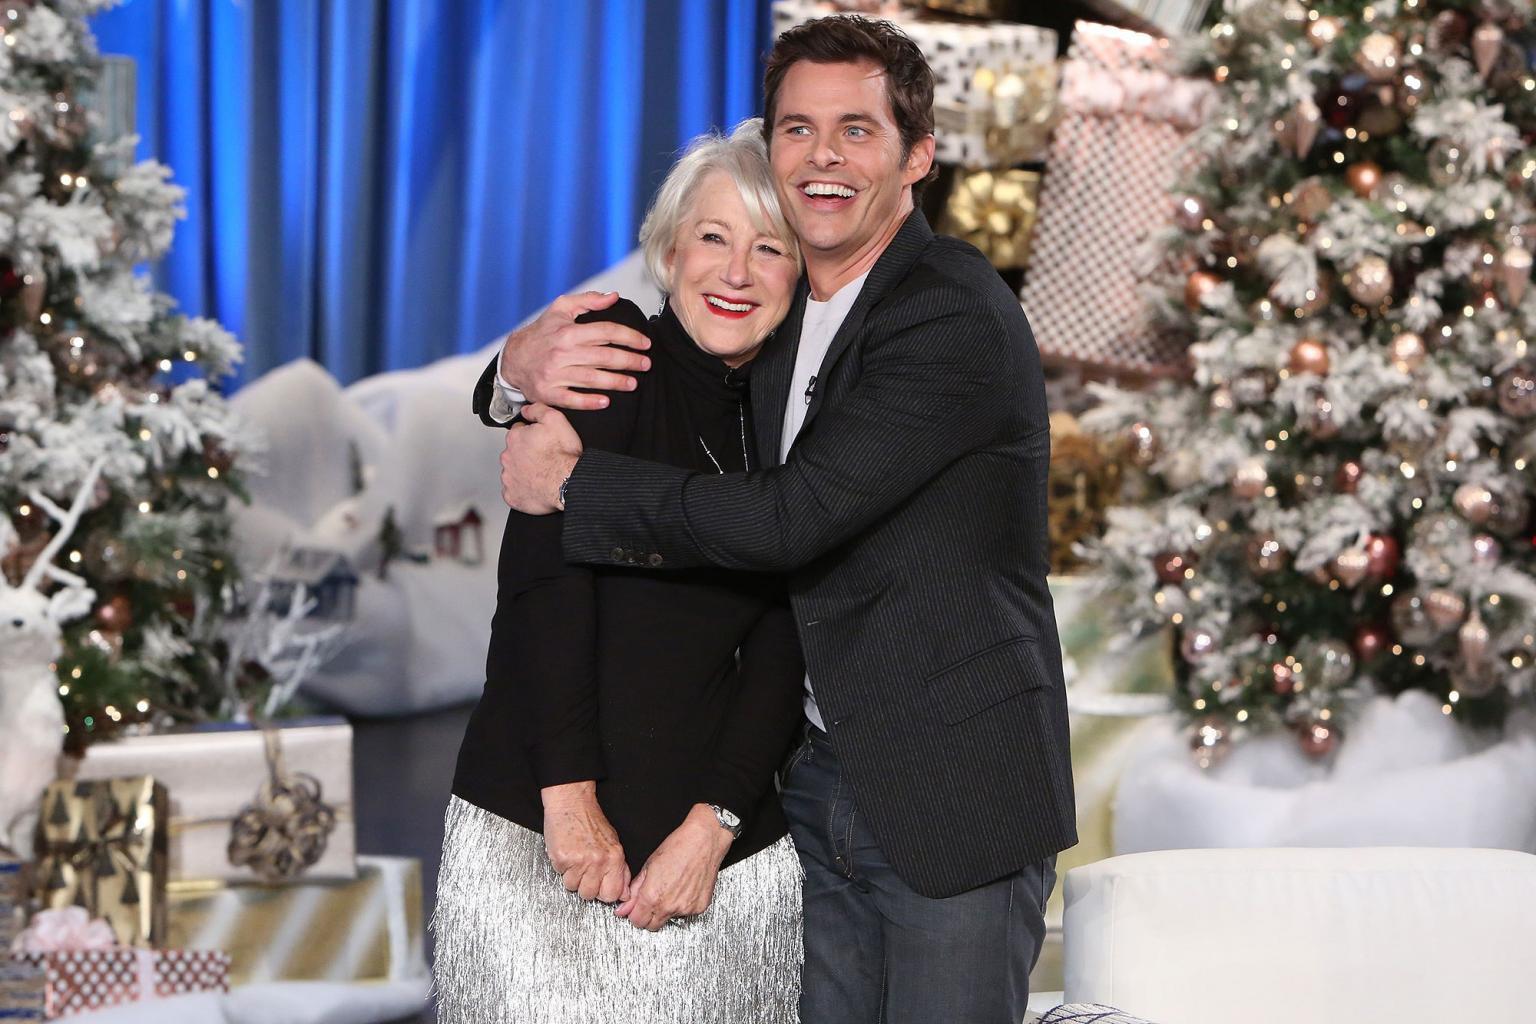 James Marsden Gets a Kiss from His Celebrity Crush Helen Mirren